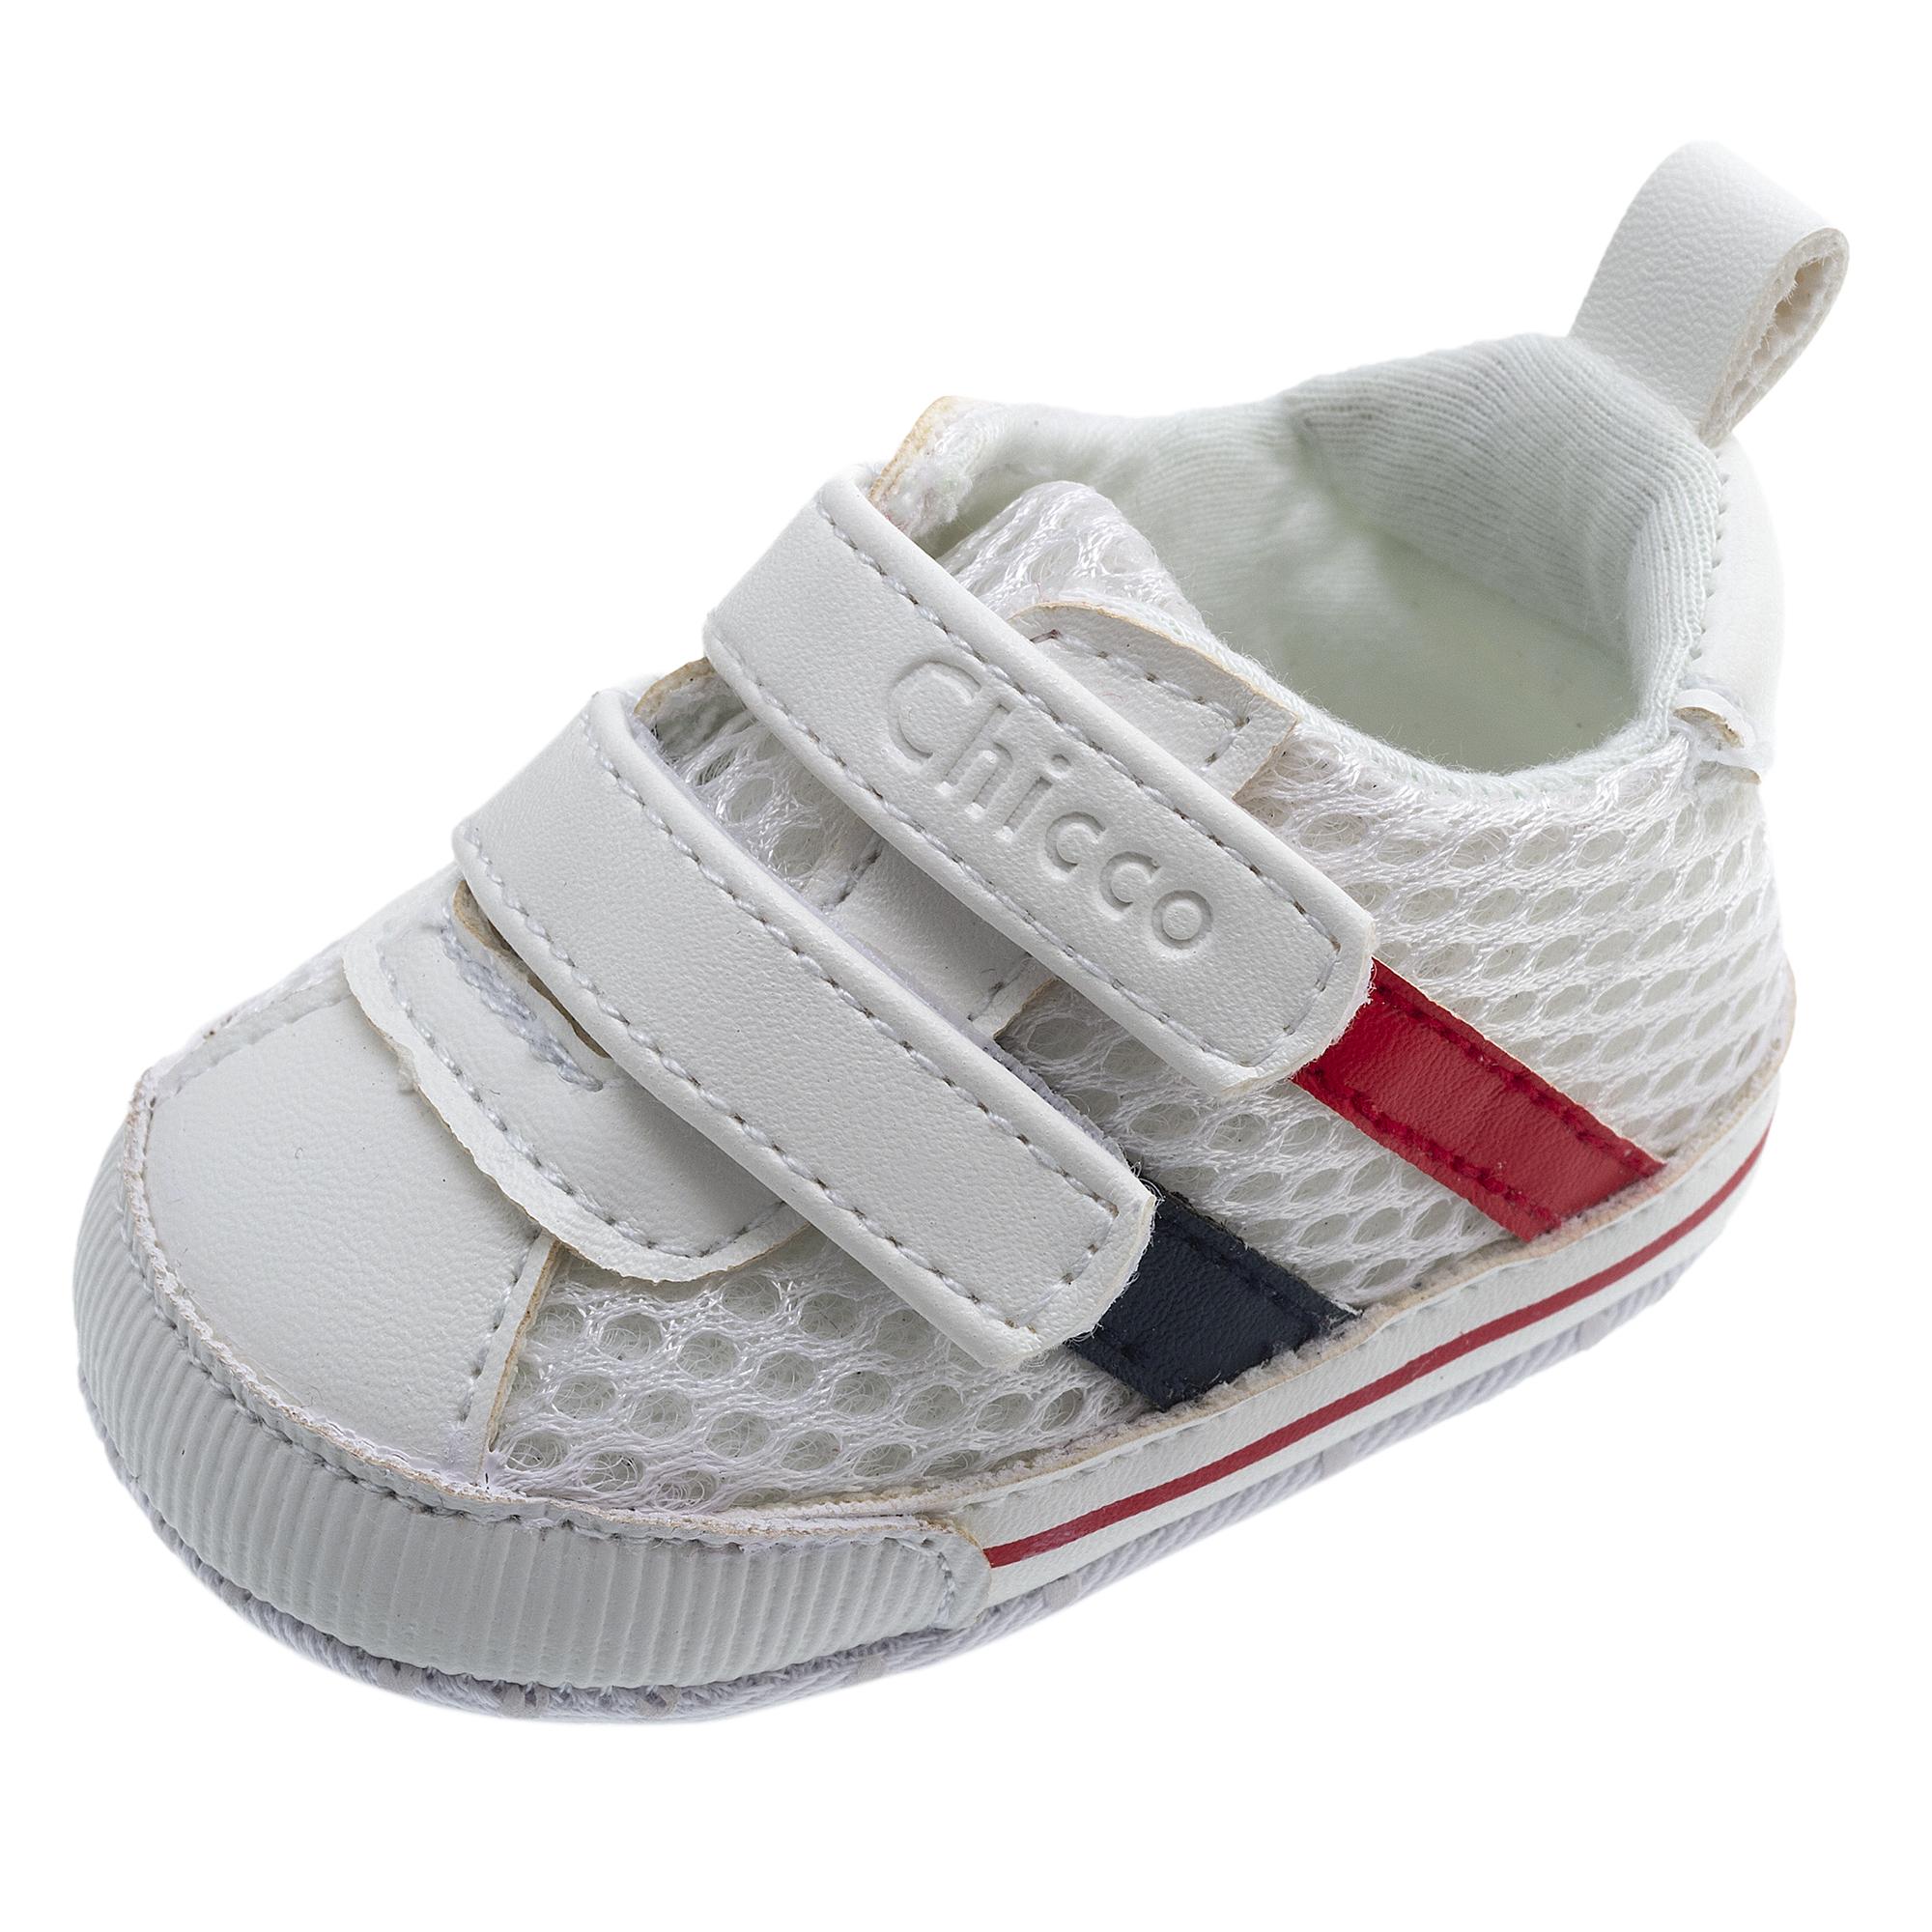 Adidasi Copii Chicco Odrian, Alb, 63122 imagine